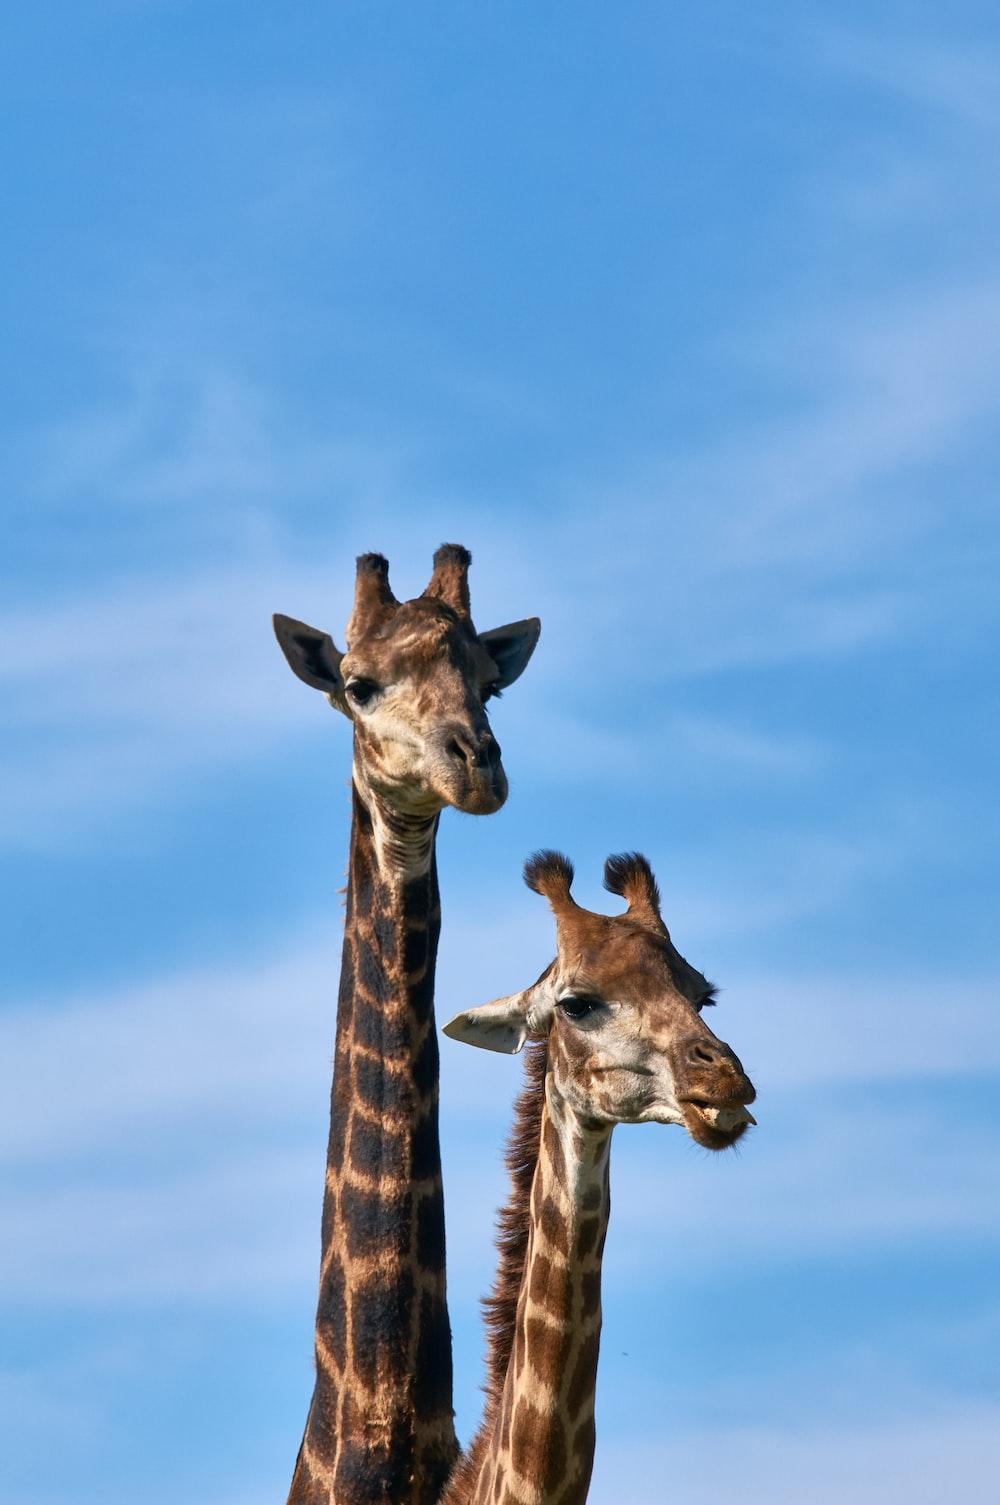 two brown giraffes